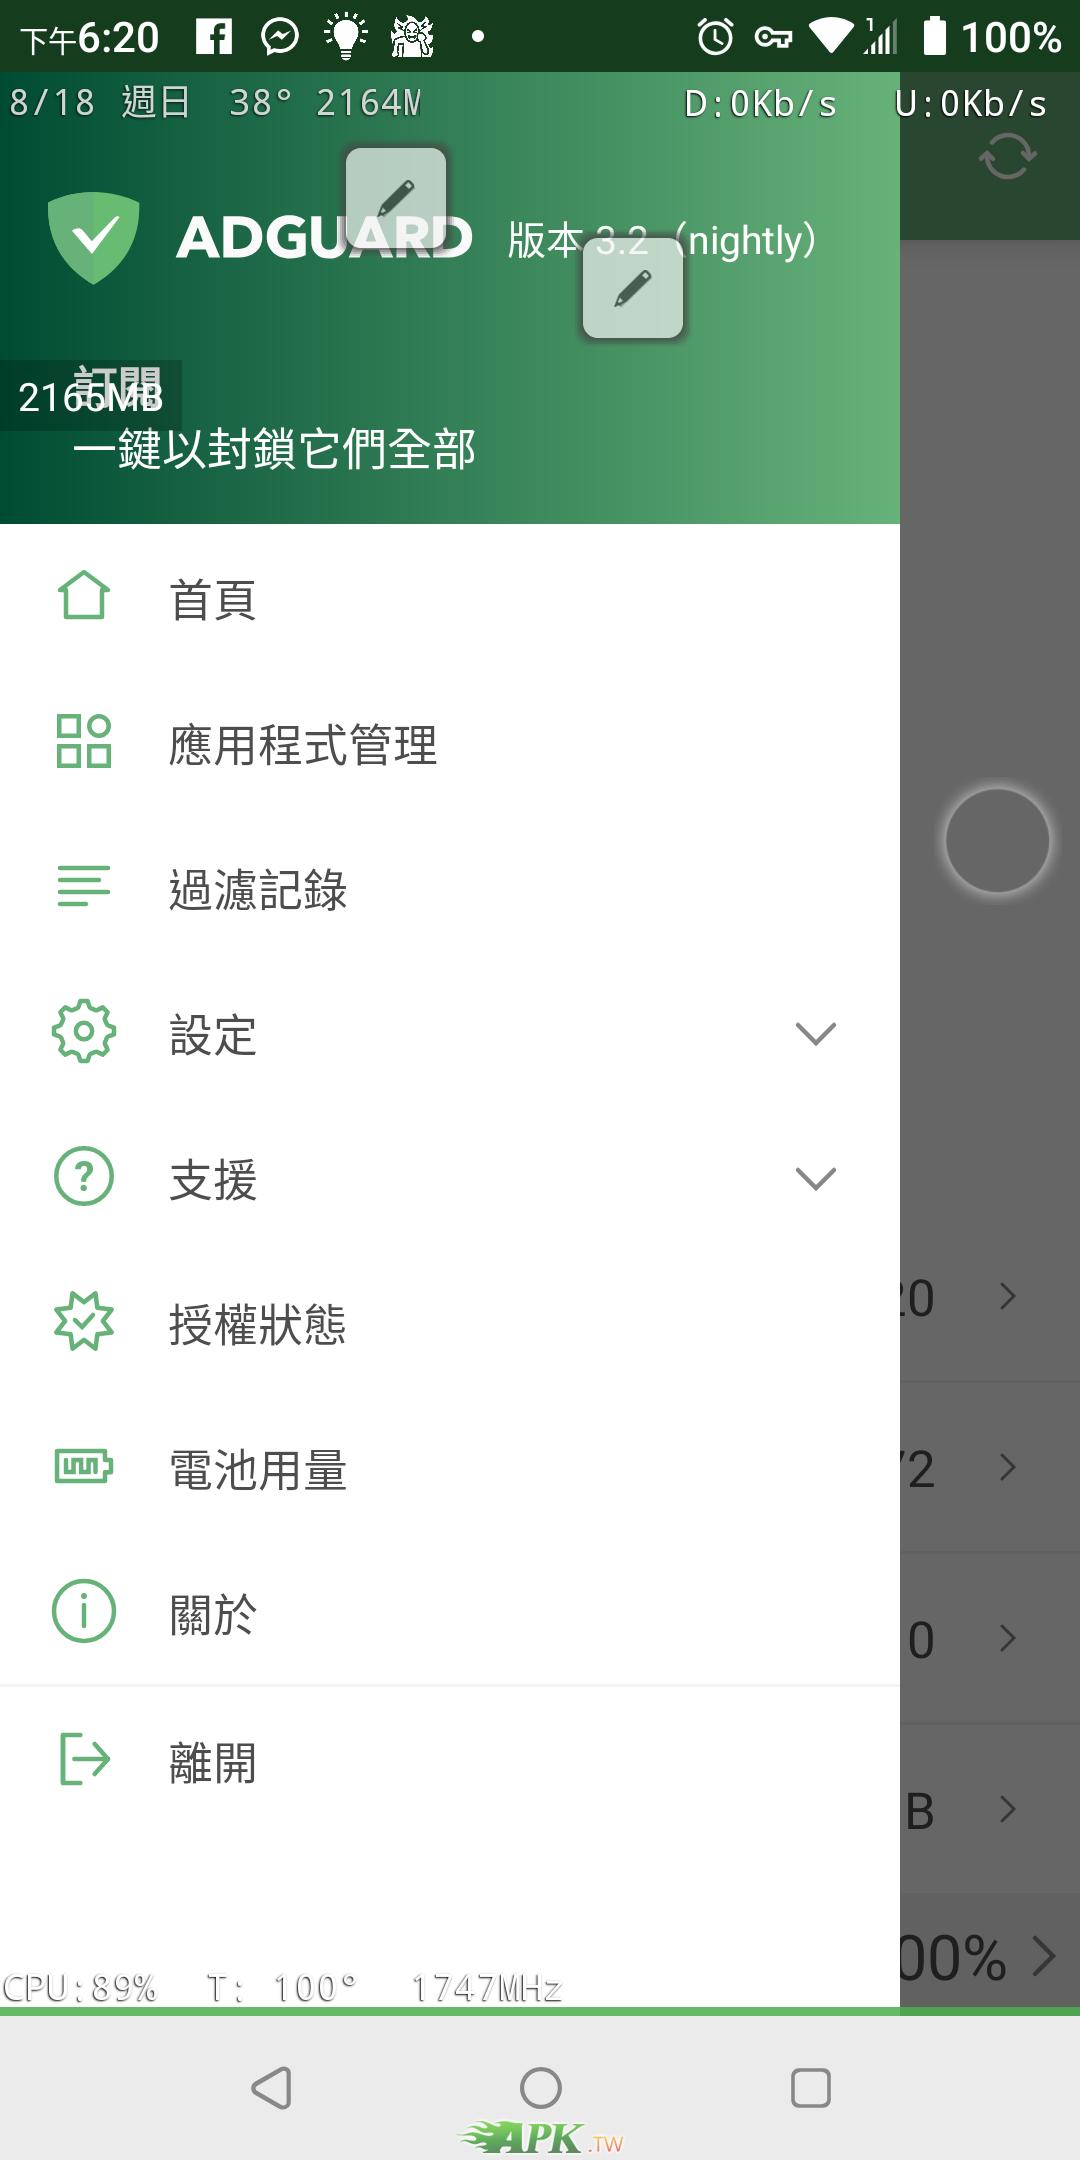 Screenshot_20190818-182033.png